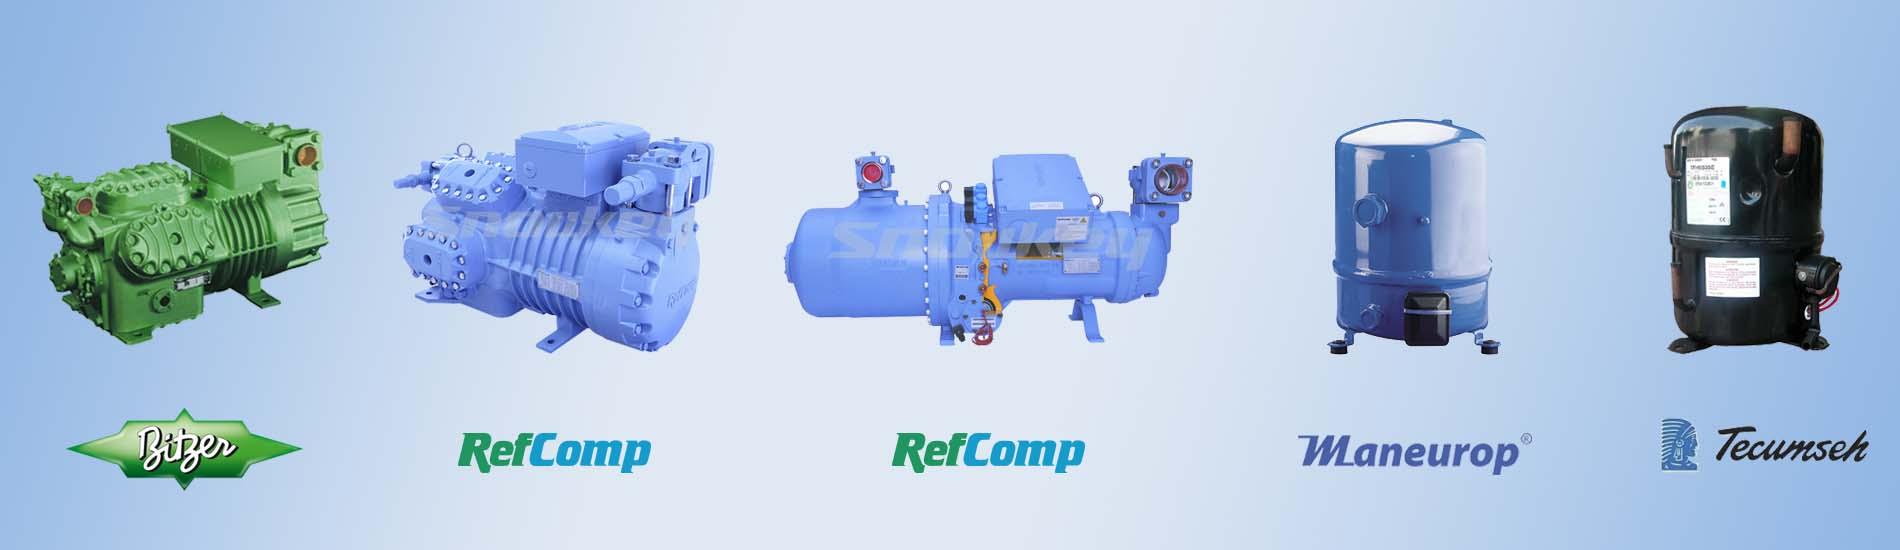 BITZER-Refcomp-TECUMSEH-Maneurop-XINGFA-ANKANG-Reciprocating-Hermetic-Screw-Compressor